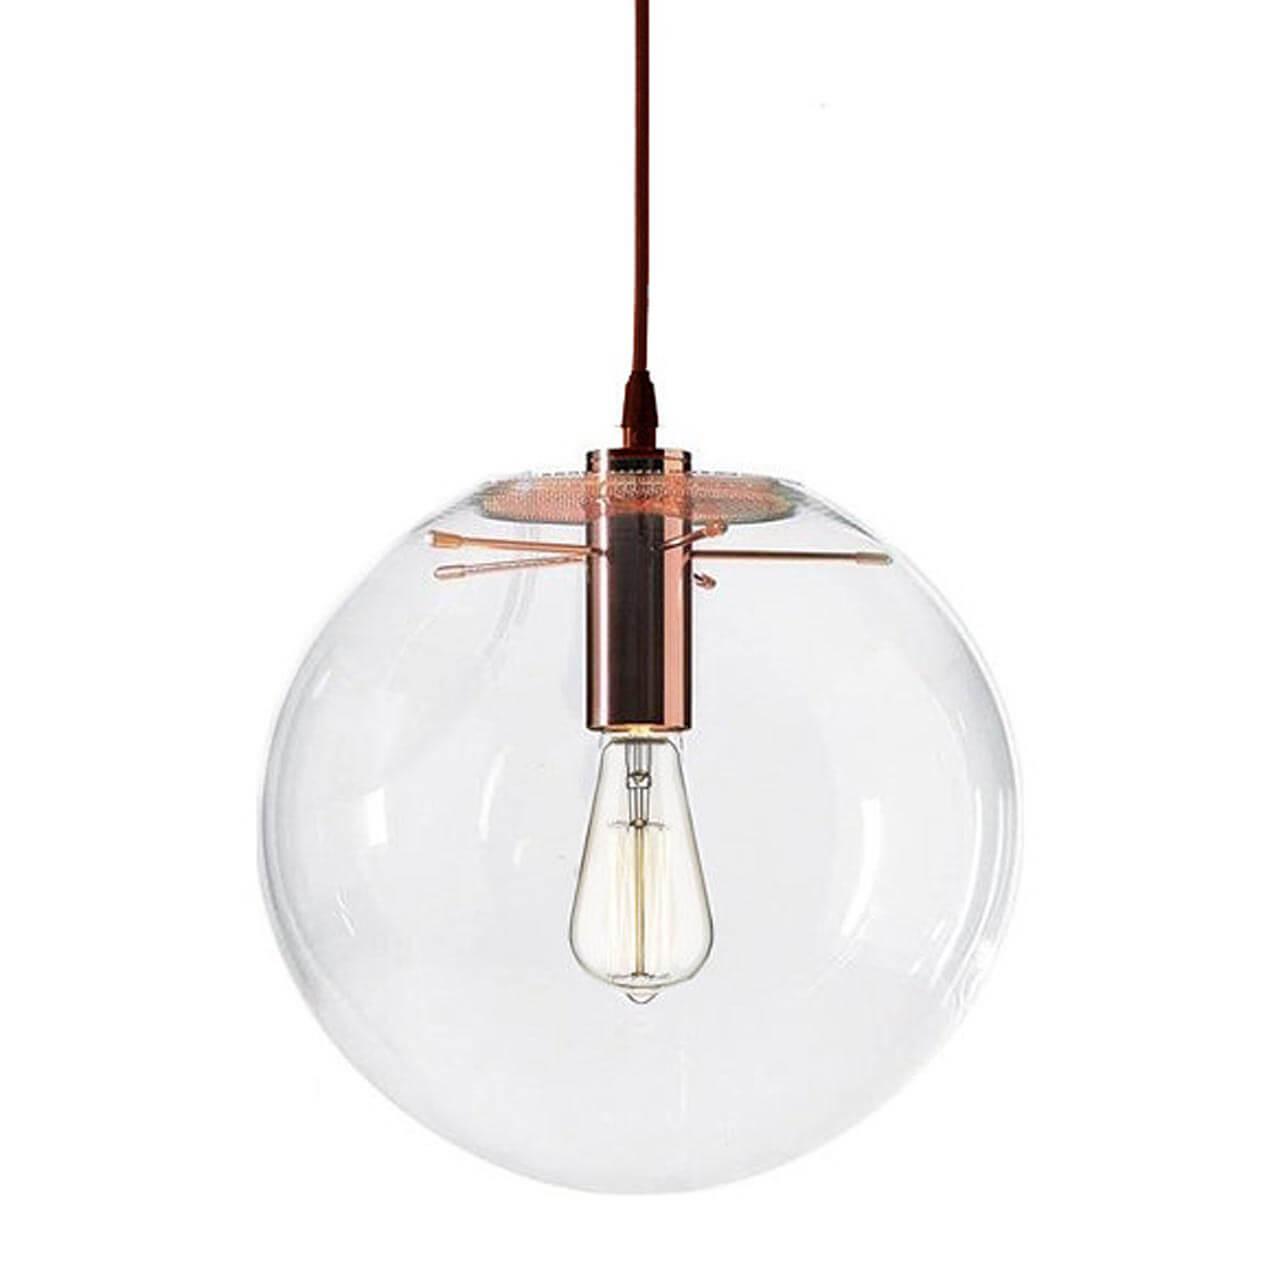 Светильник Kink Light 07564-25,21 Меркурий